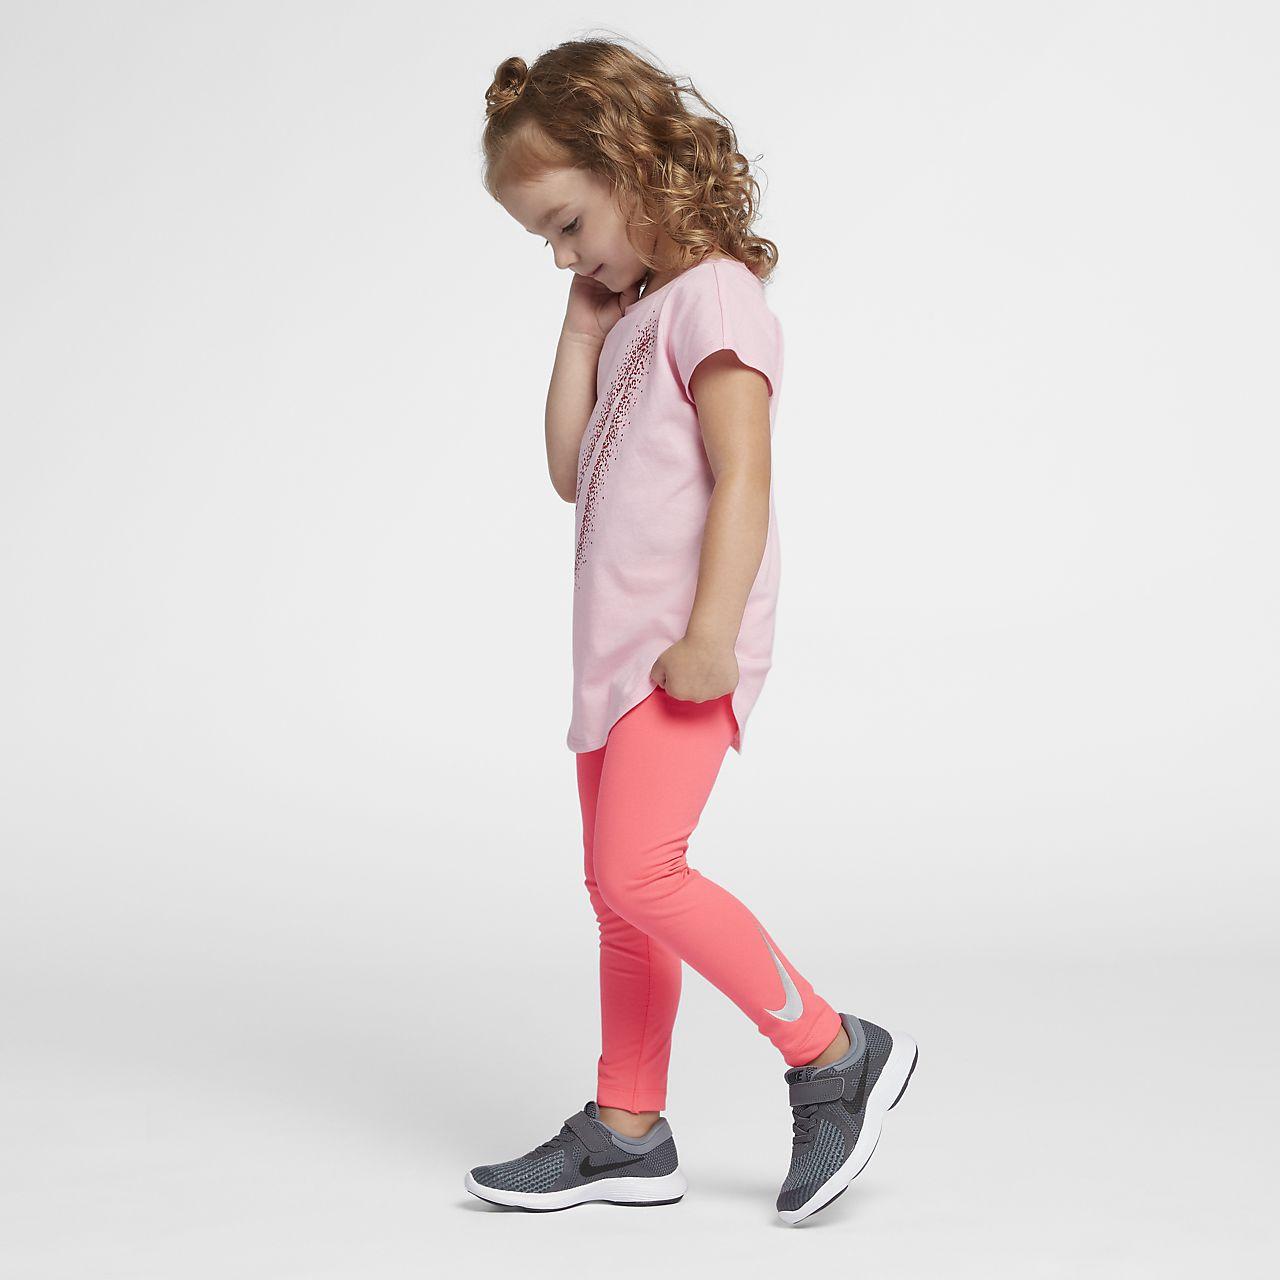 Nike Dri Fit Baby And Toddler Girls Leggings